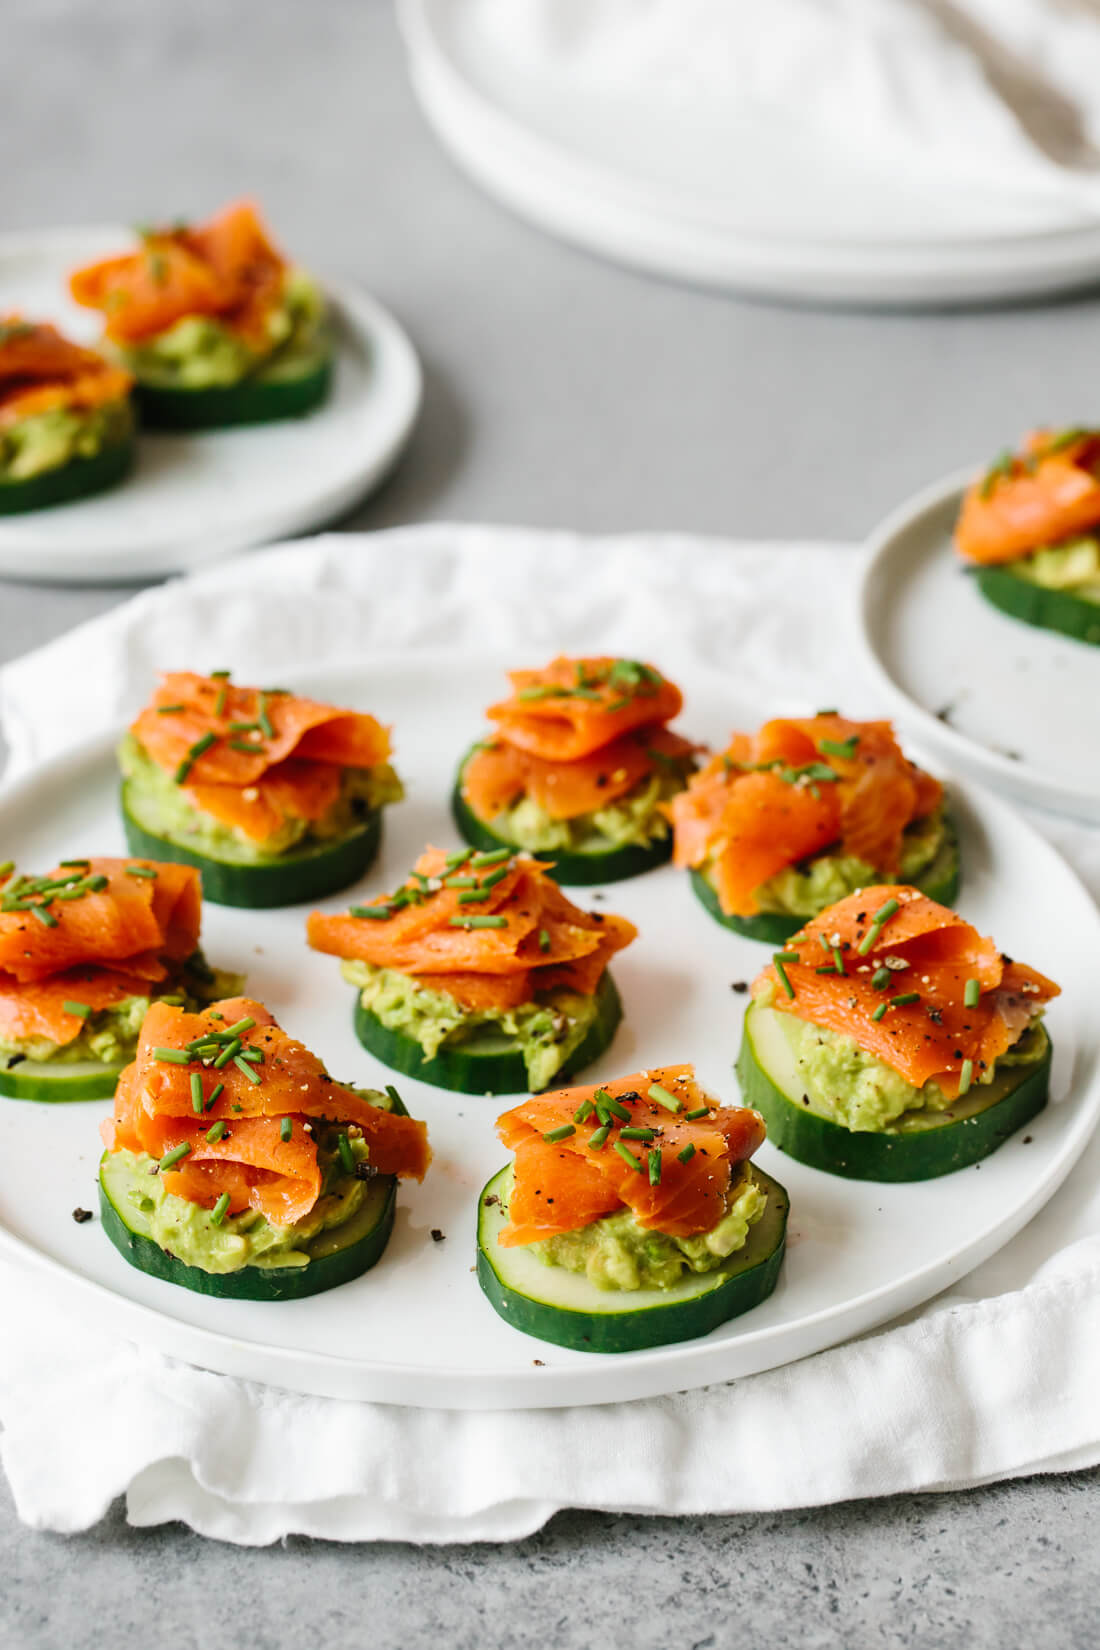 Smoked Salmon Avocado And Cucumber Bites Downshiftology